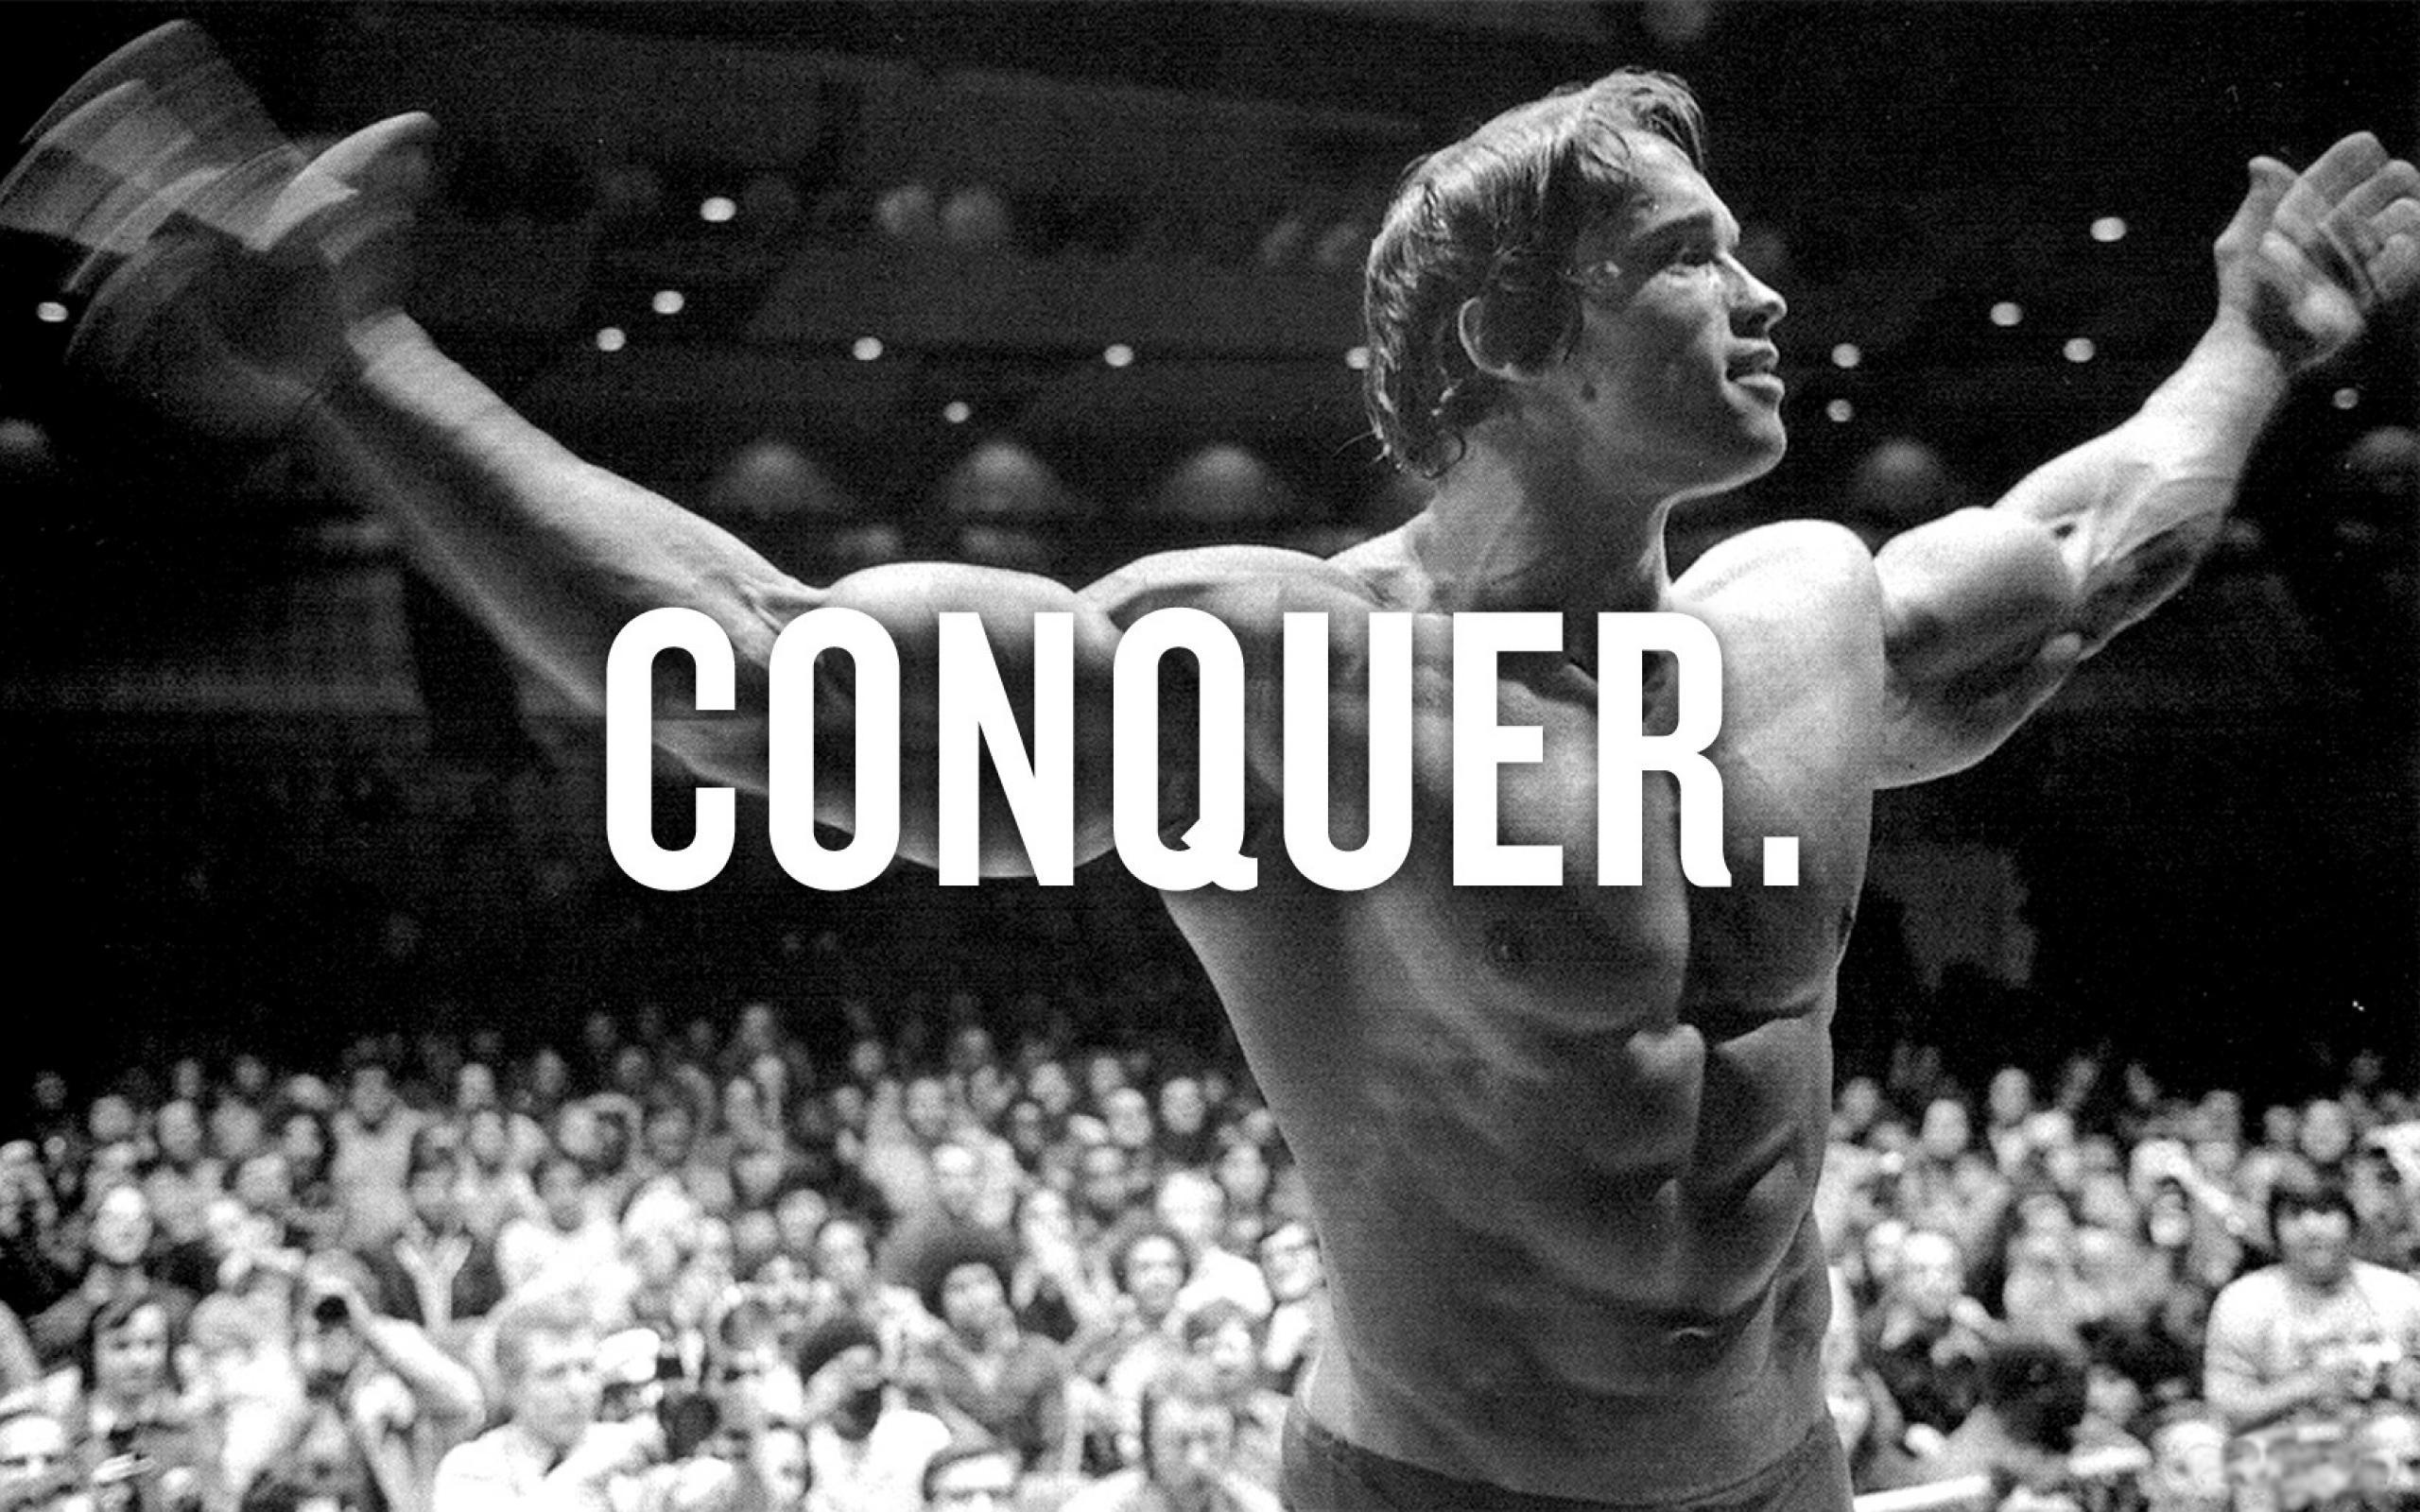 Arnold Schwarzenegger Conquer Wallpaper 73 images 2560x1600